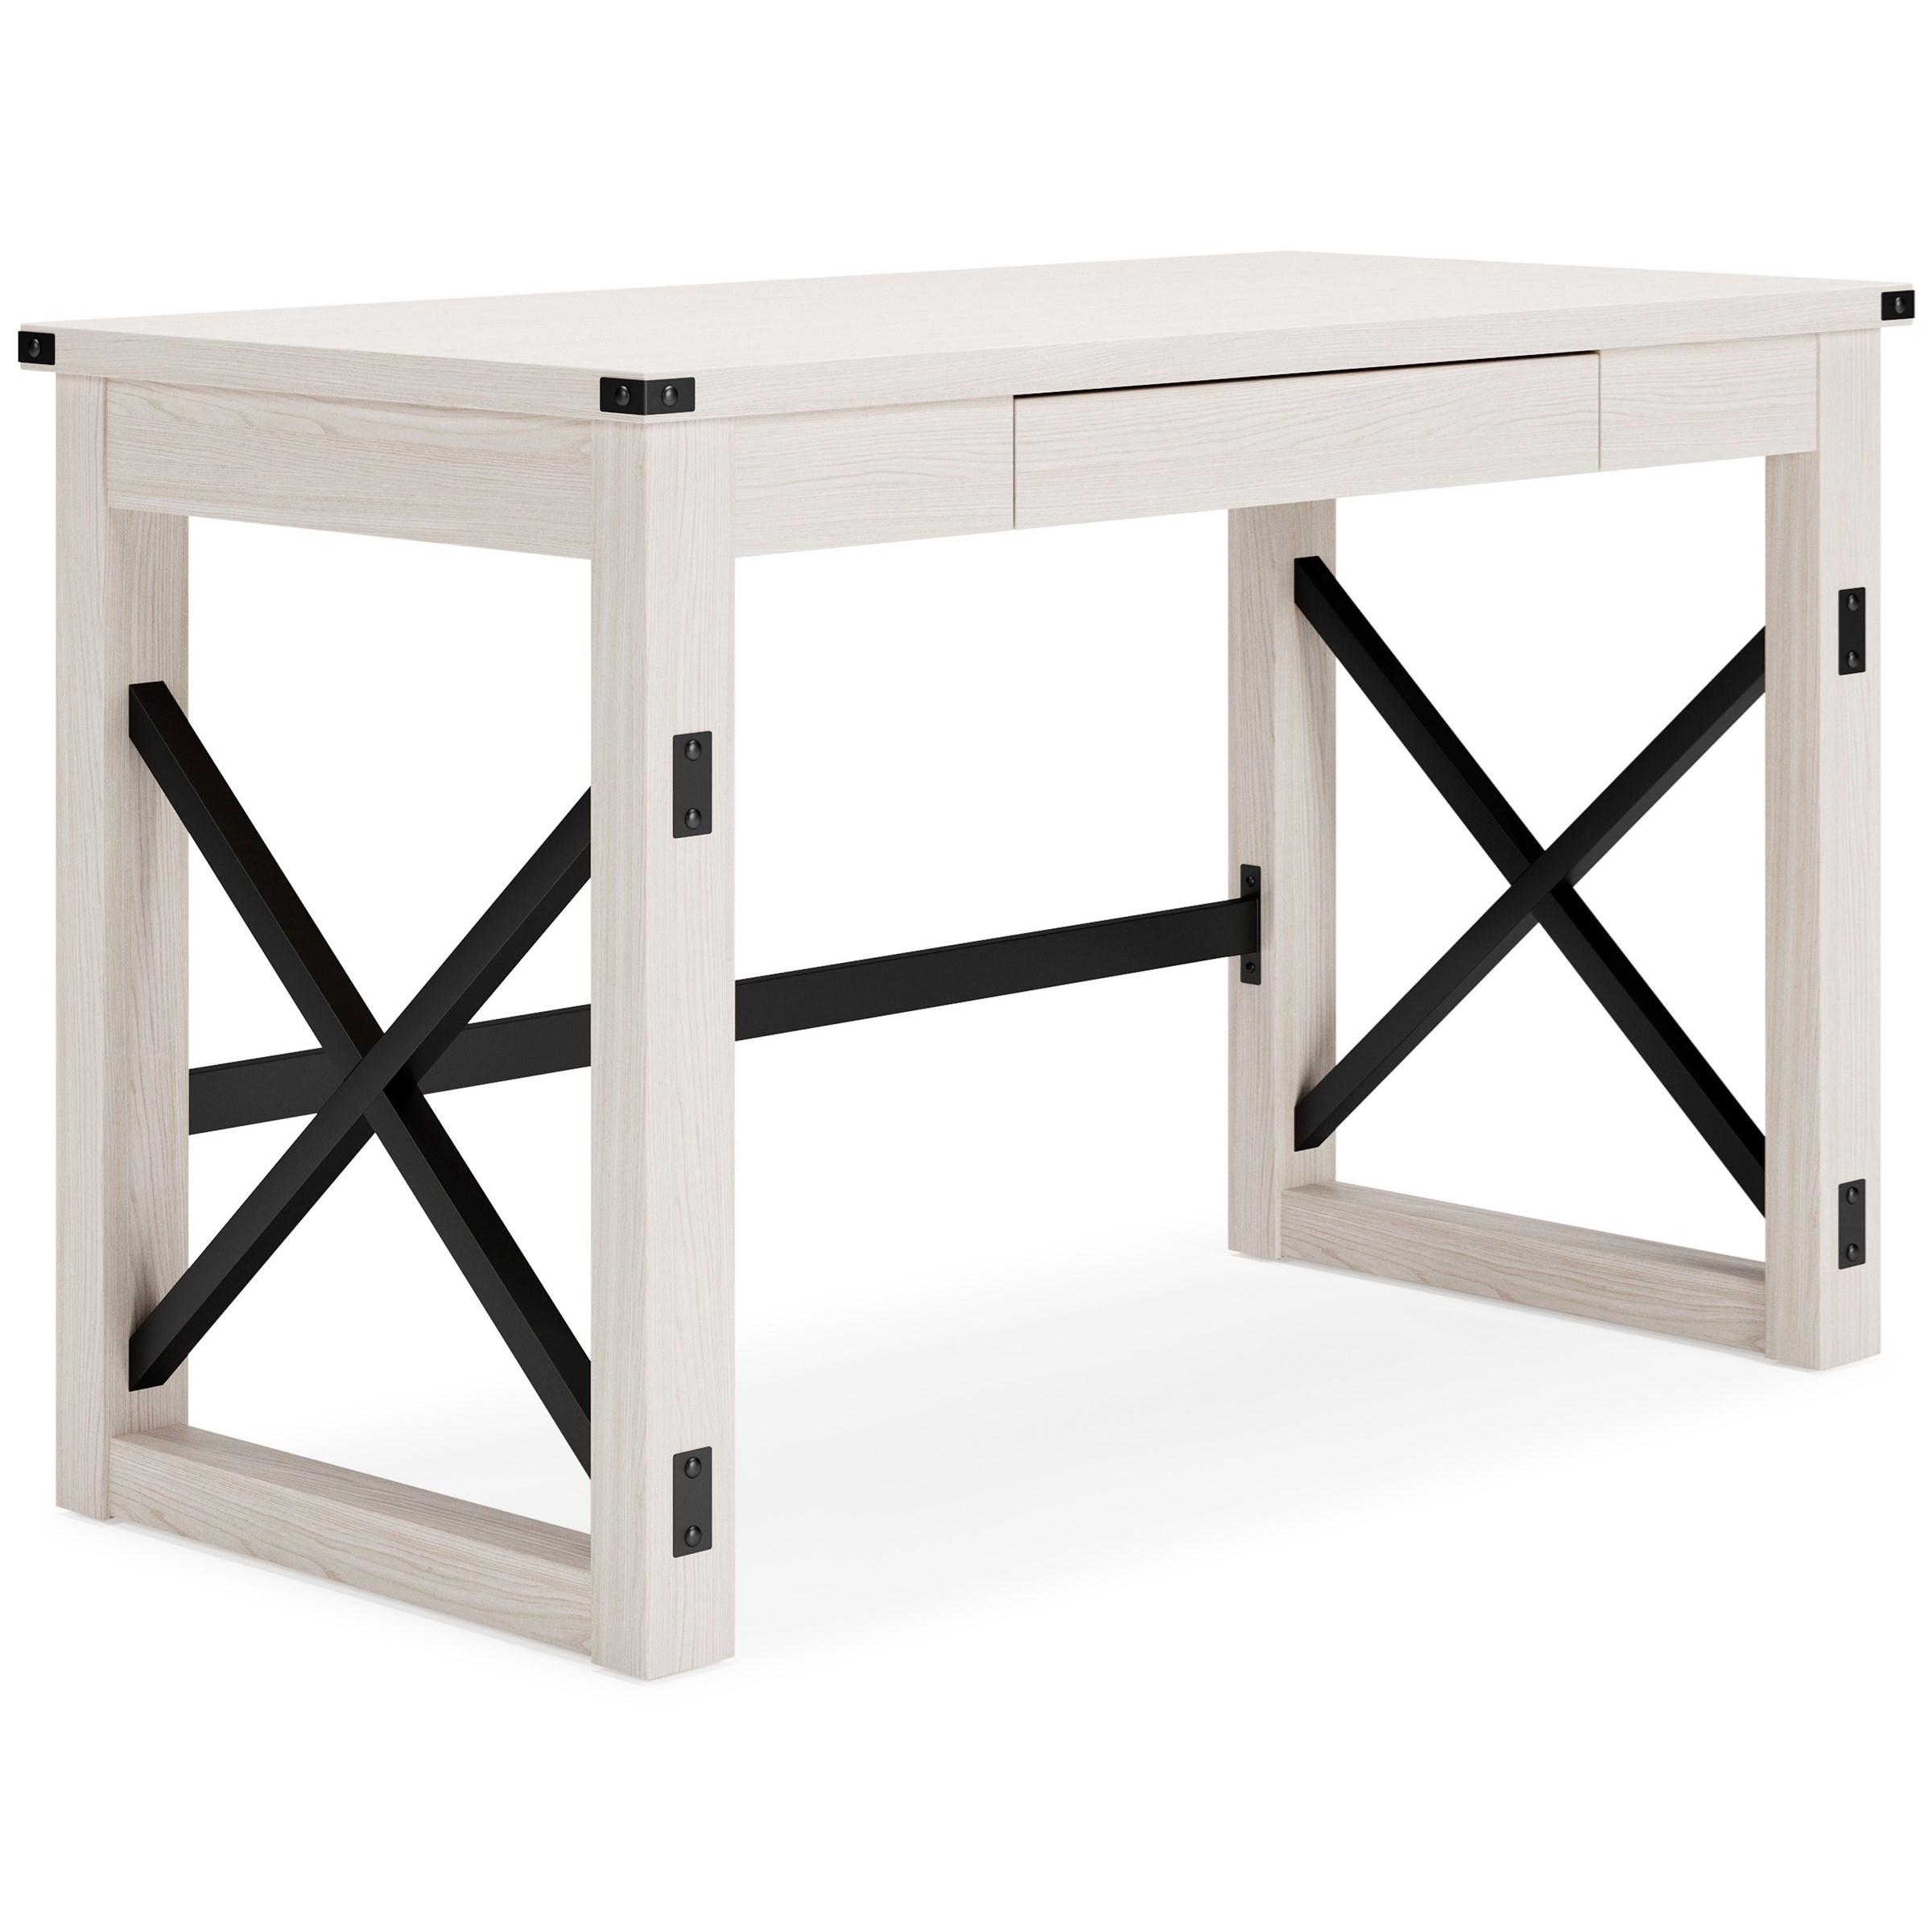 "Bayflynn 48"" Home Office Desk by Signature Design by Ashley at Furniture Barn"